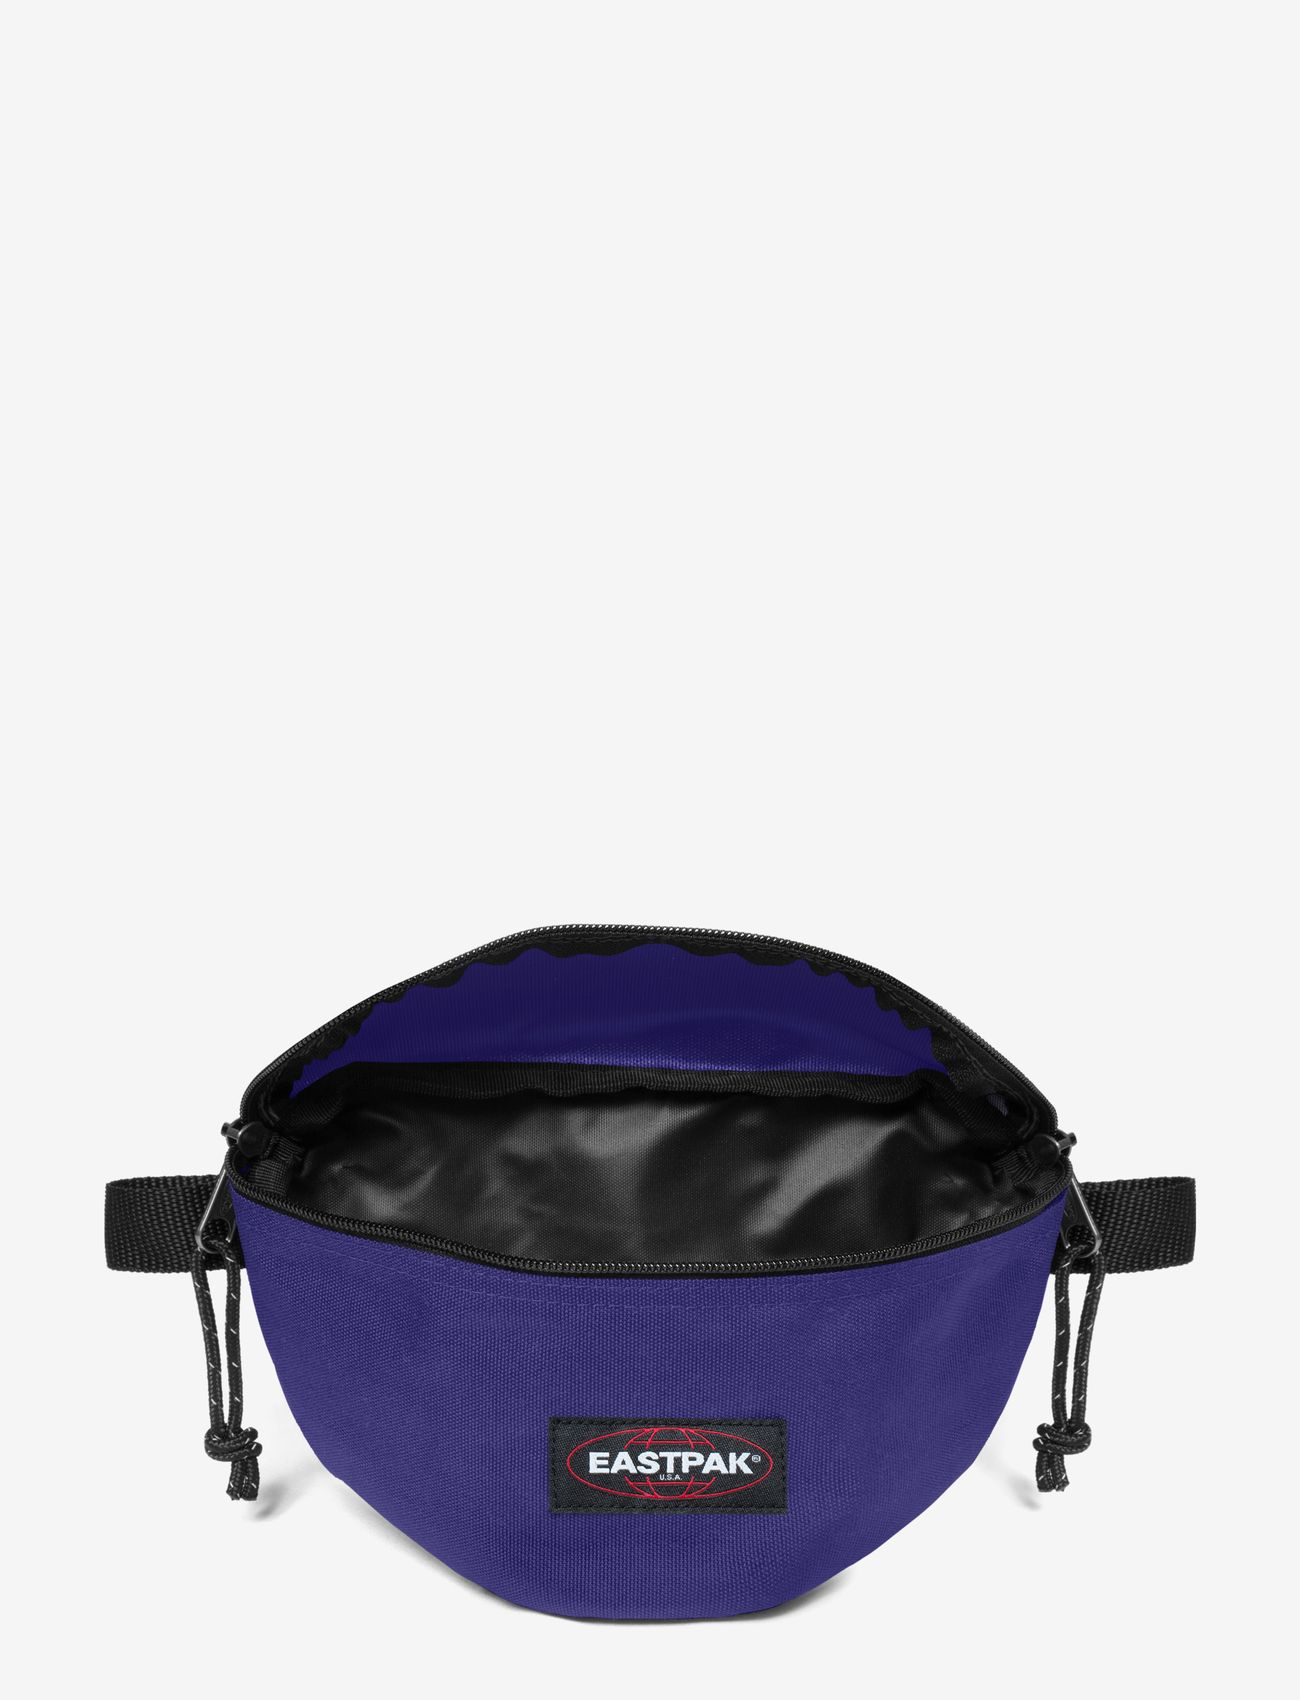 Eastpak - SPRINGER - heuptassen - amethyst purple - 1